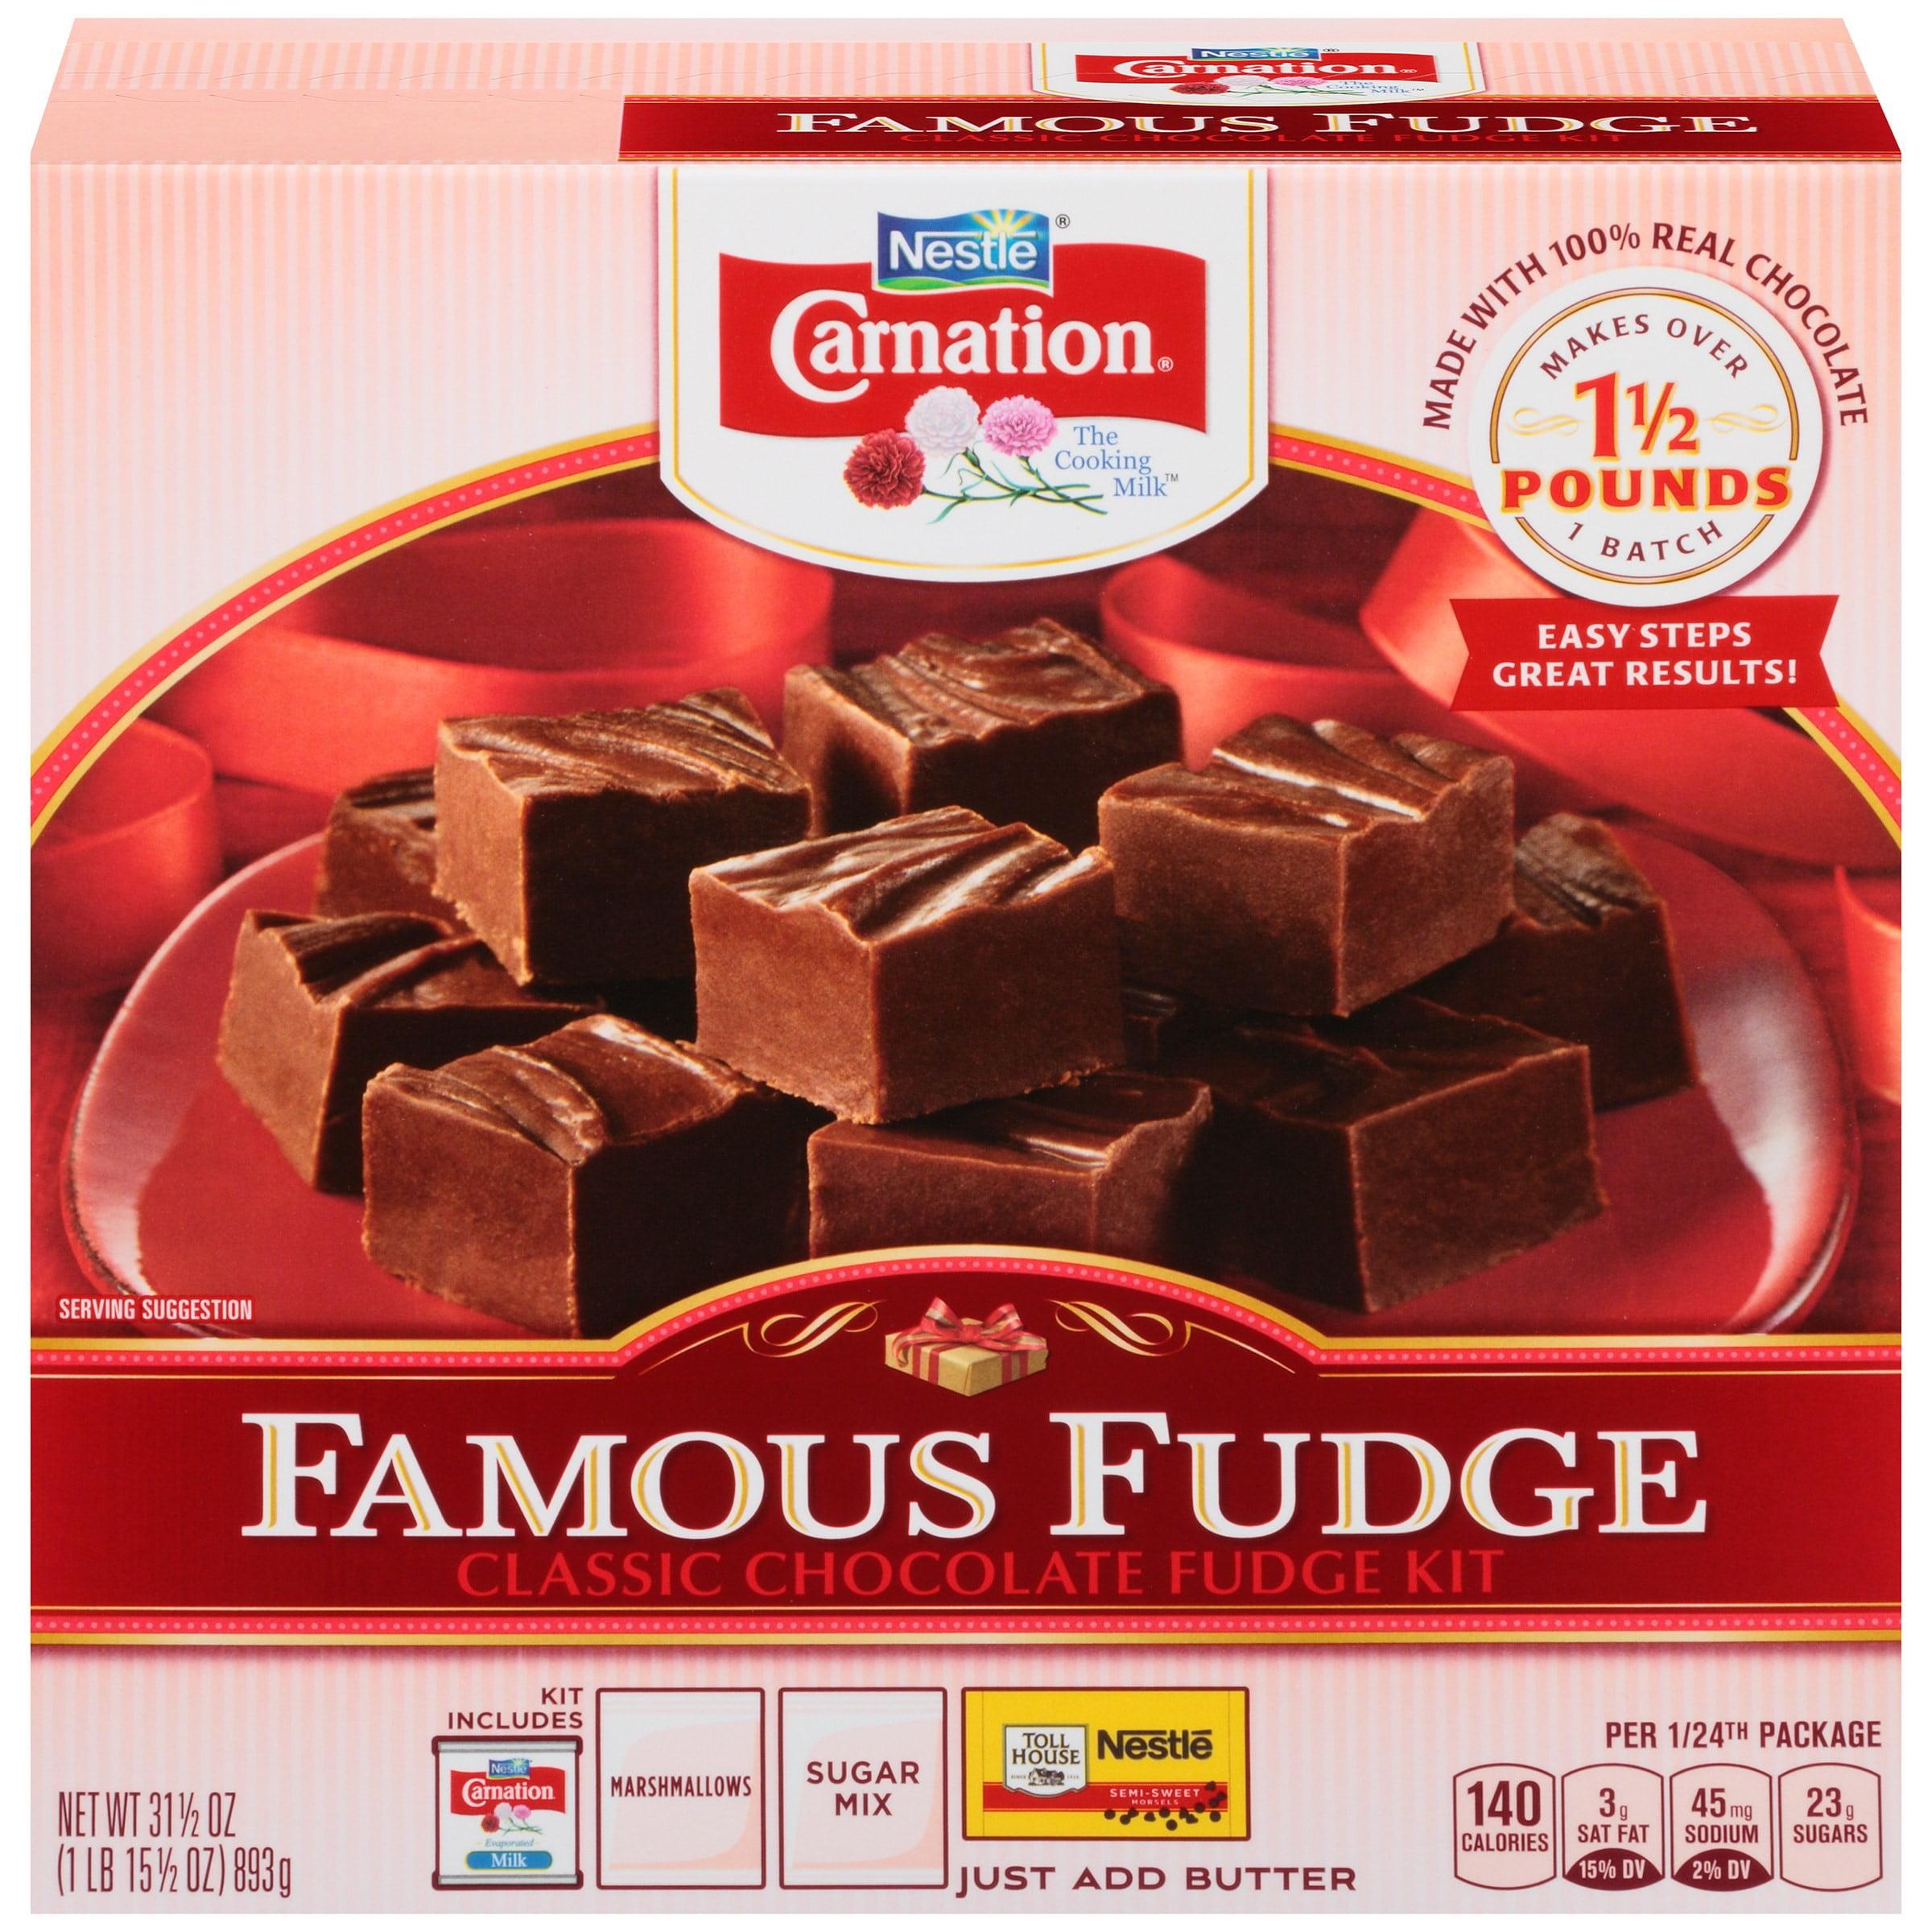 Carnation Famous Fudge Classic Chocolate Fudge Kit 31.5 oz. Box